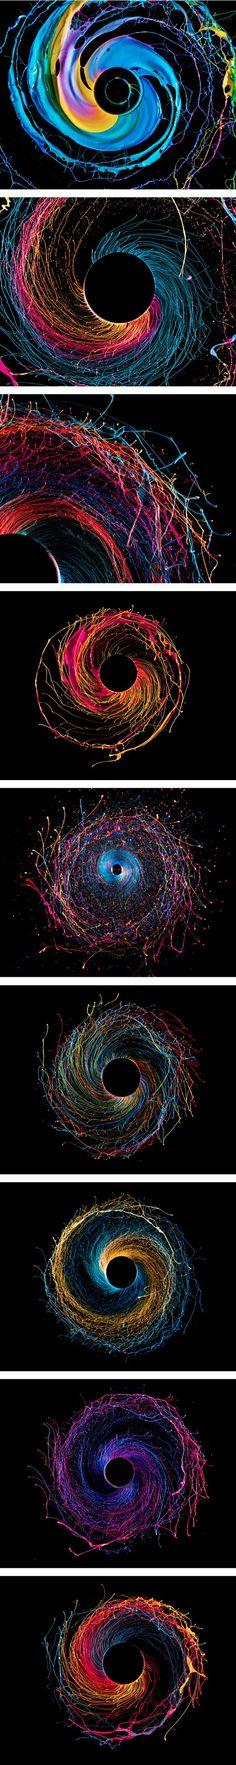 1000+ images about black hole on Pinterest | Black holes ...